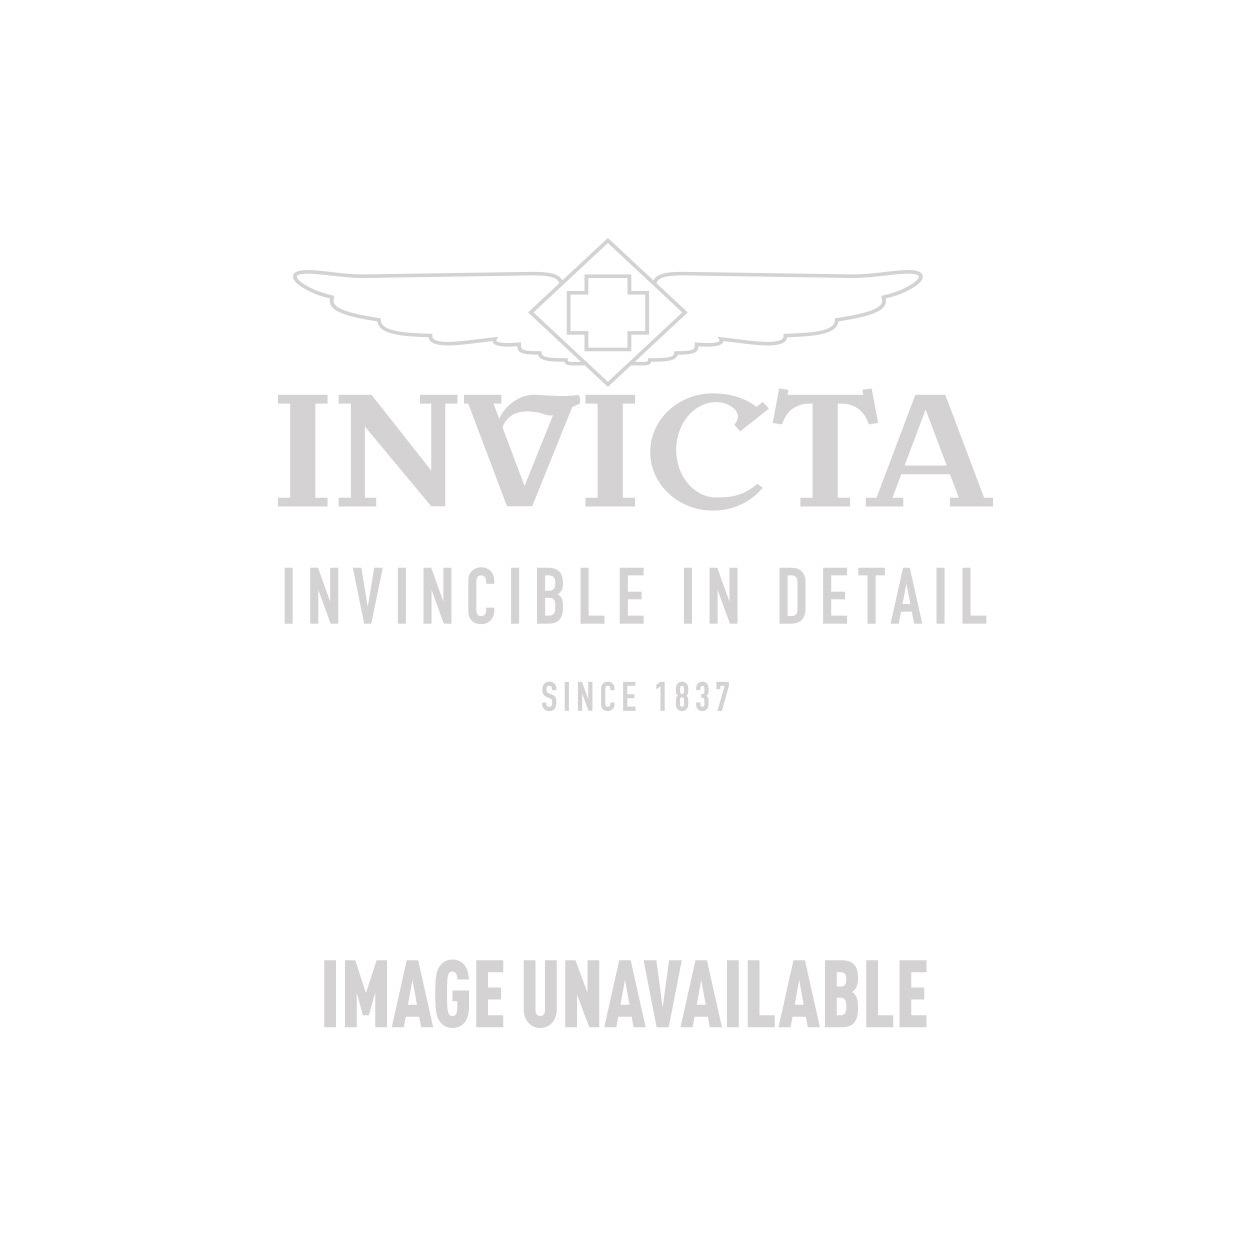 Invicta I-Force Quartz Watch - Black case with Black tone Silicone band - Model 16909